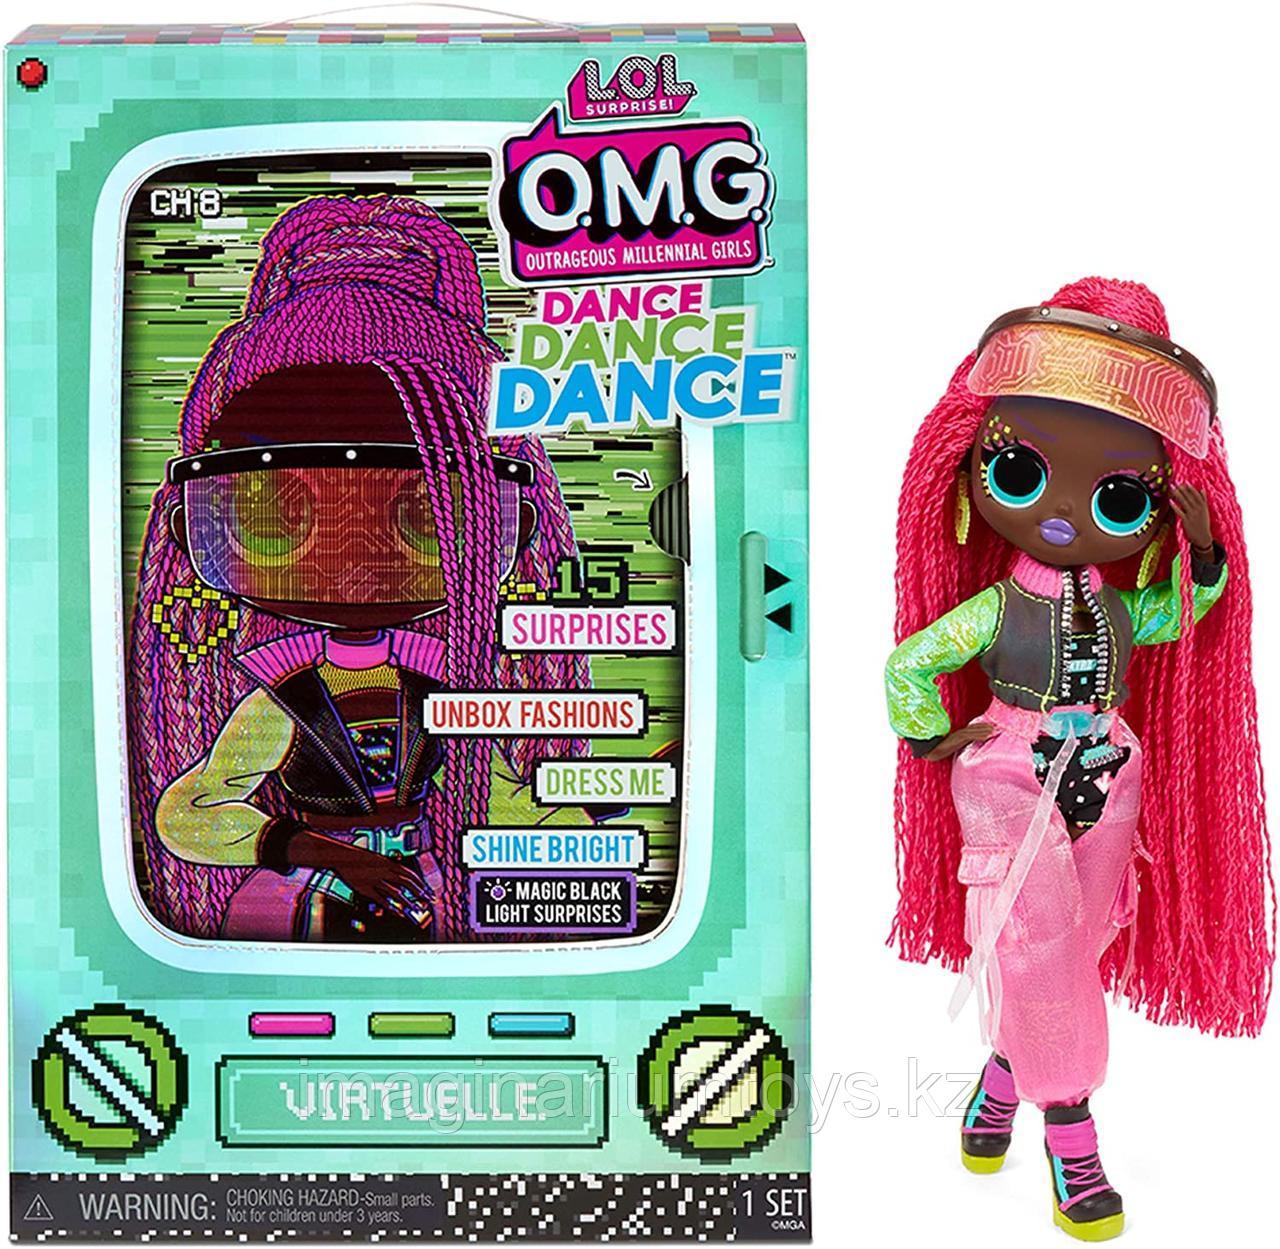 Кукла ЛОЛ ОМГ Танцы LOL Surprise OMG Dance Virtuelle - фото 1